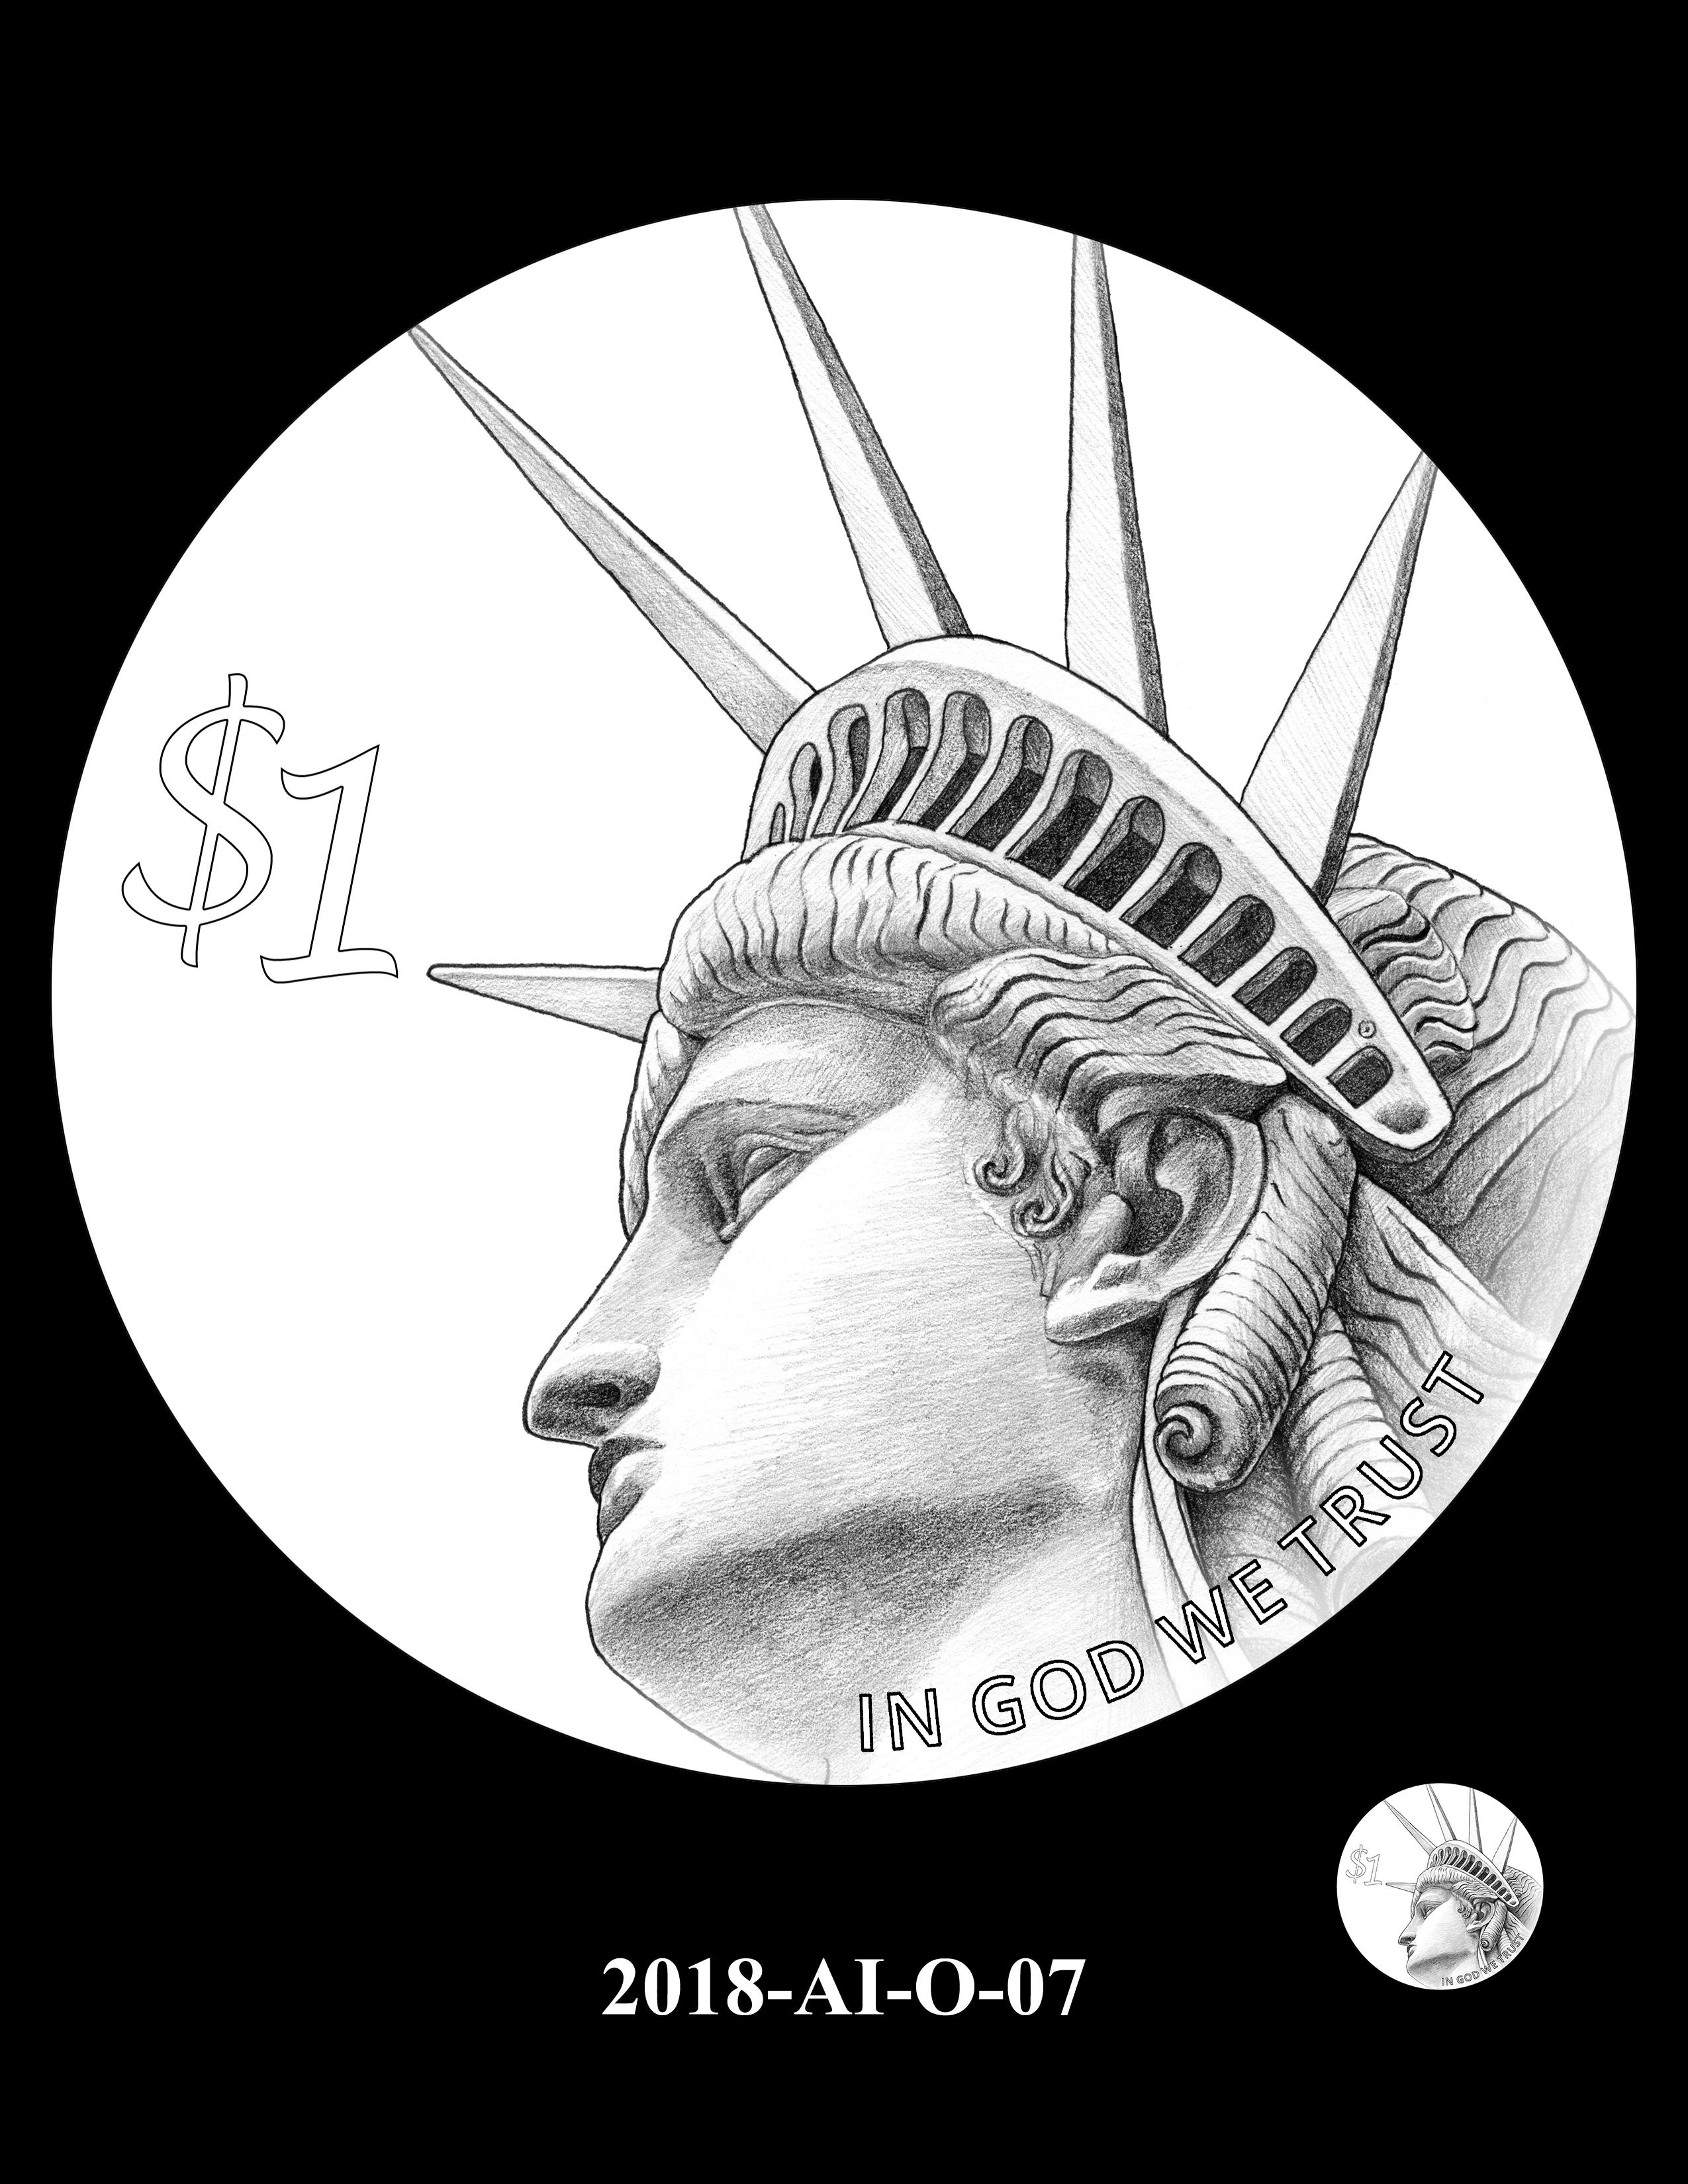 2018-AI-O-07 -- 2018 American Innovation $1 Coin